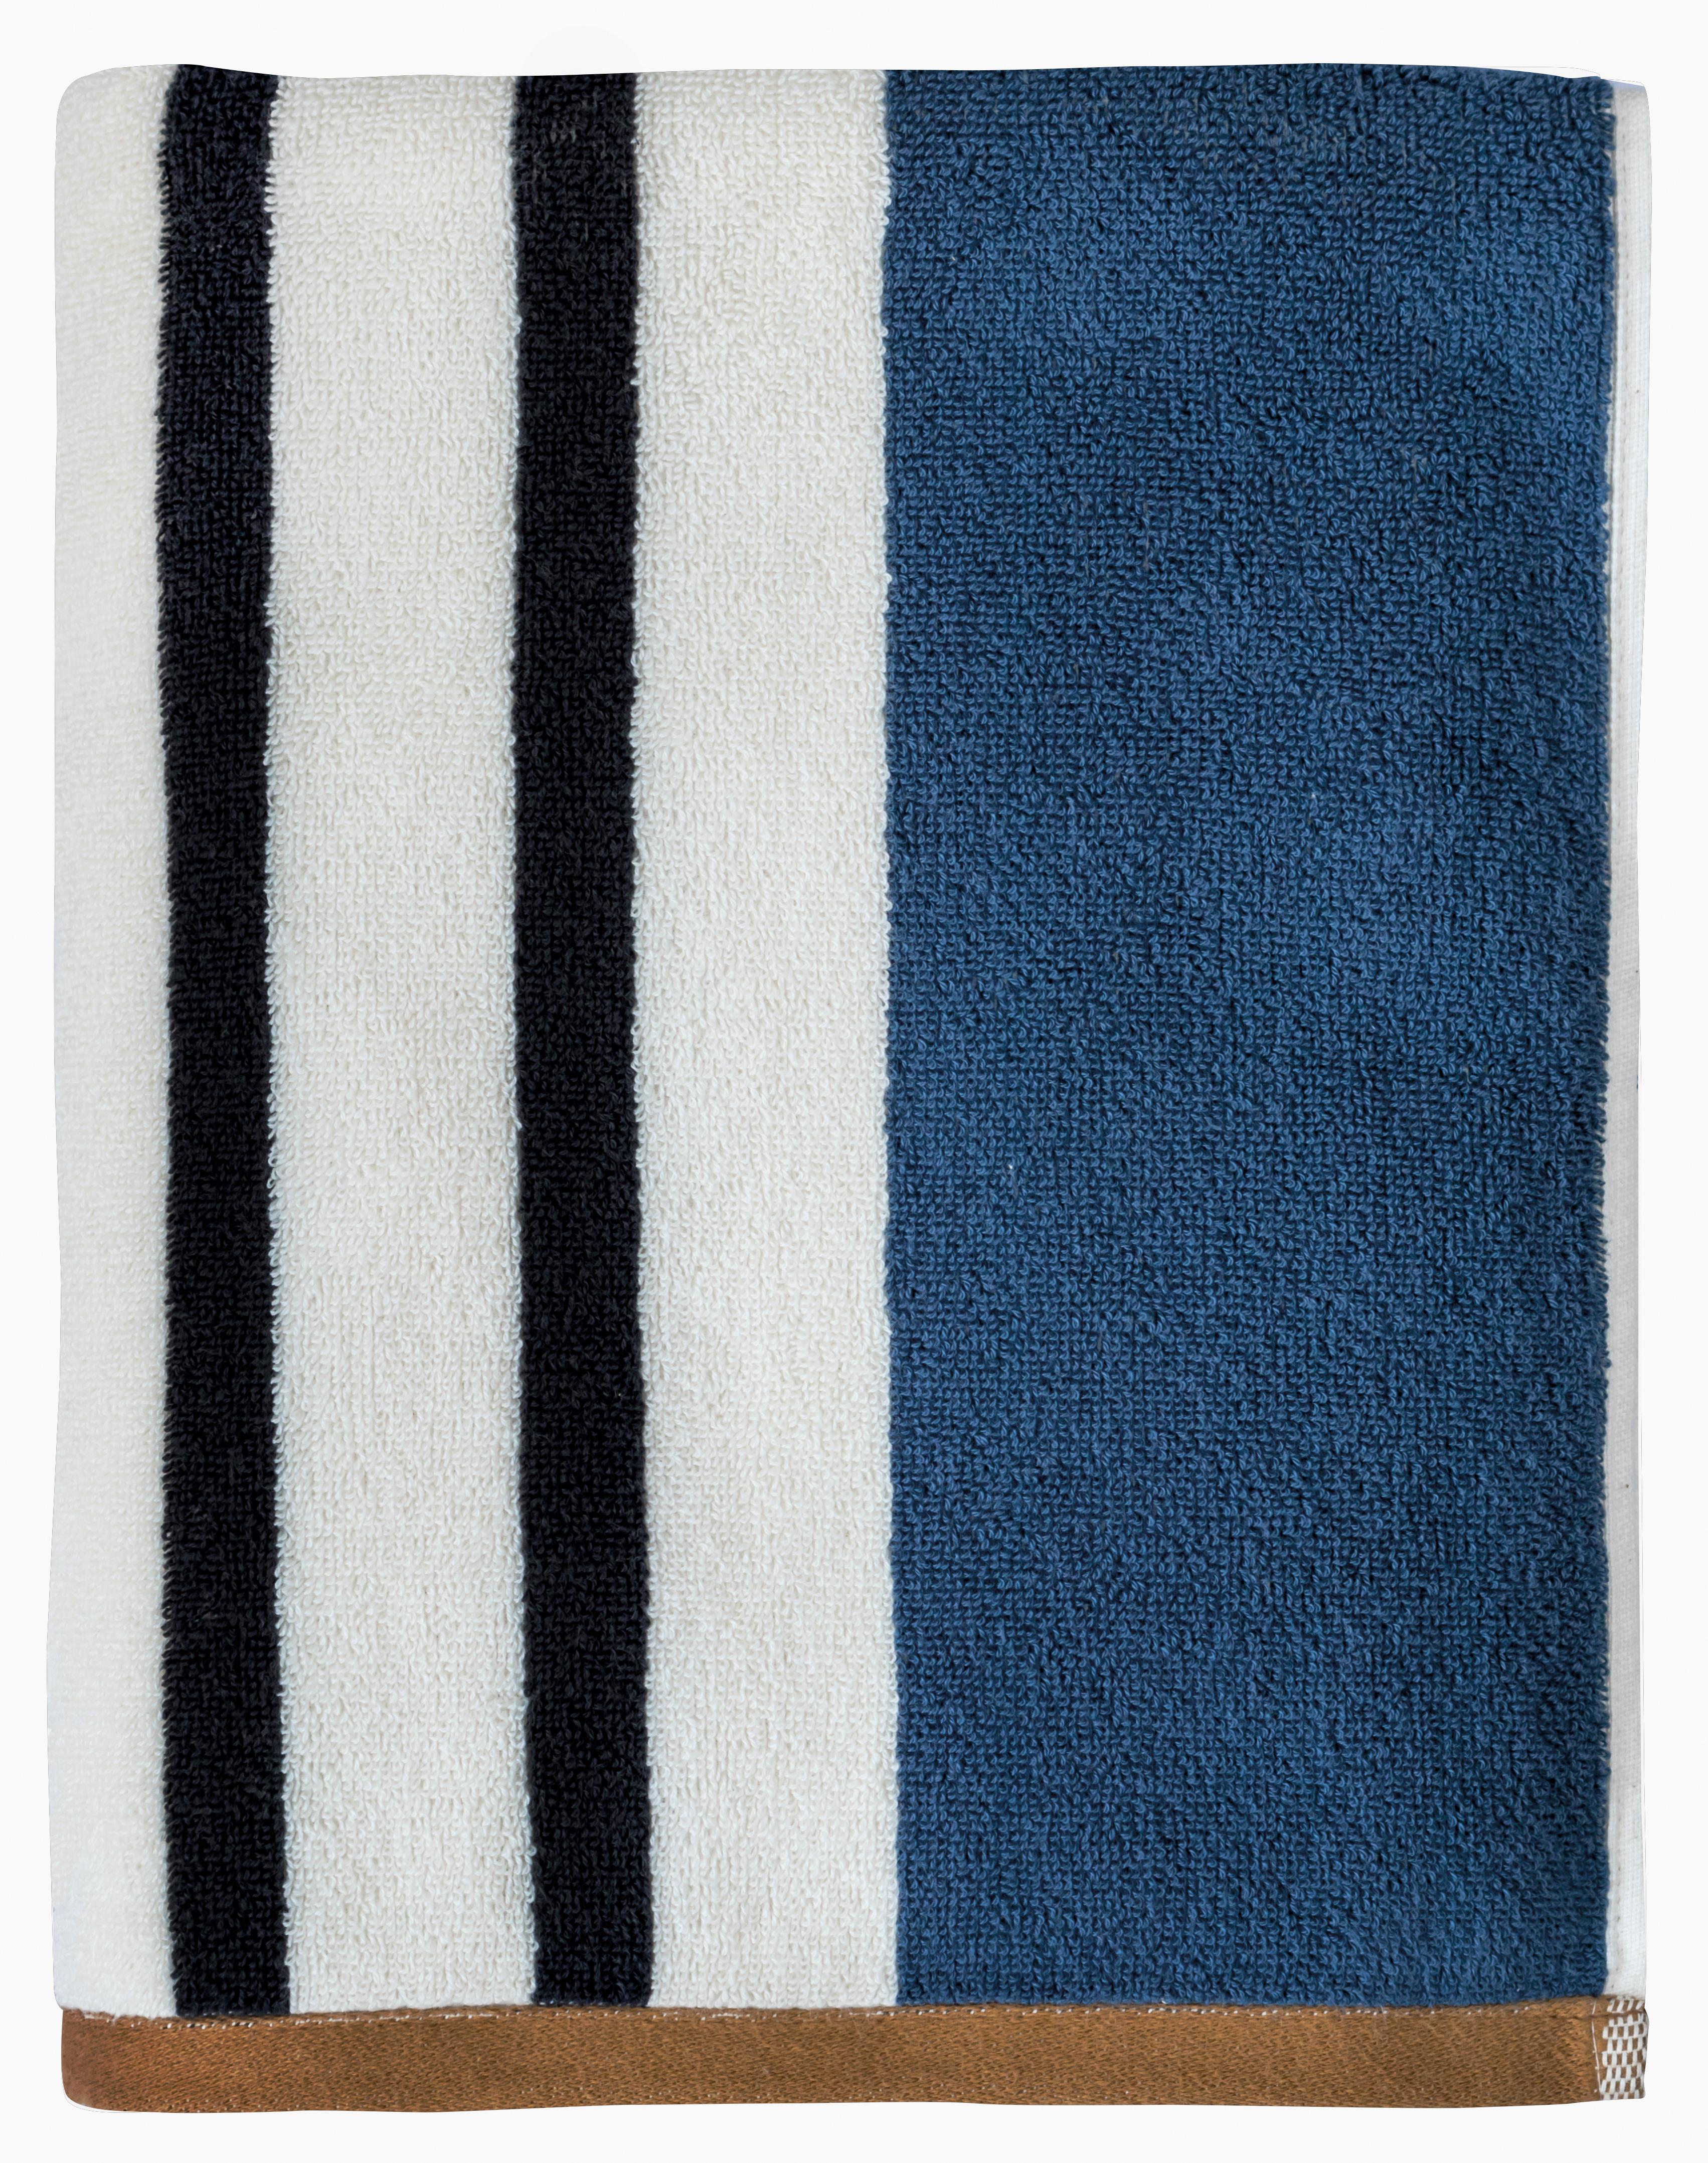 Mette Ditmer Boudoir håndklæde